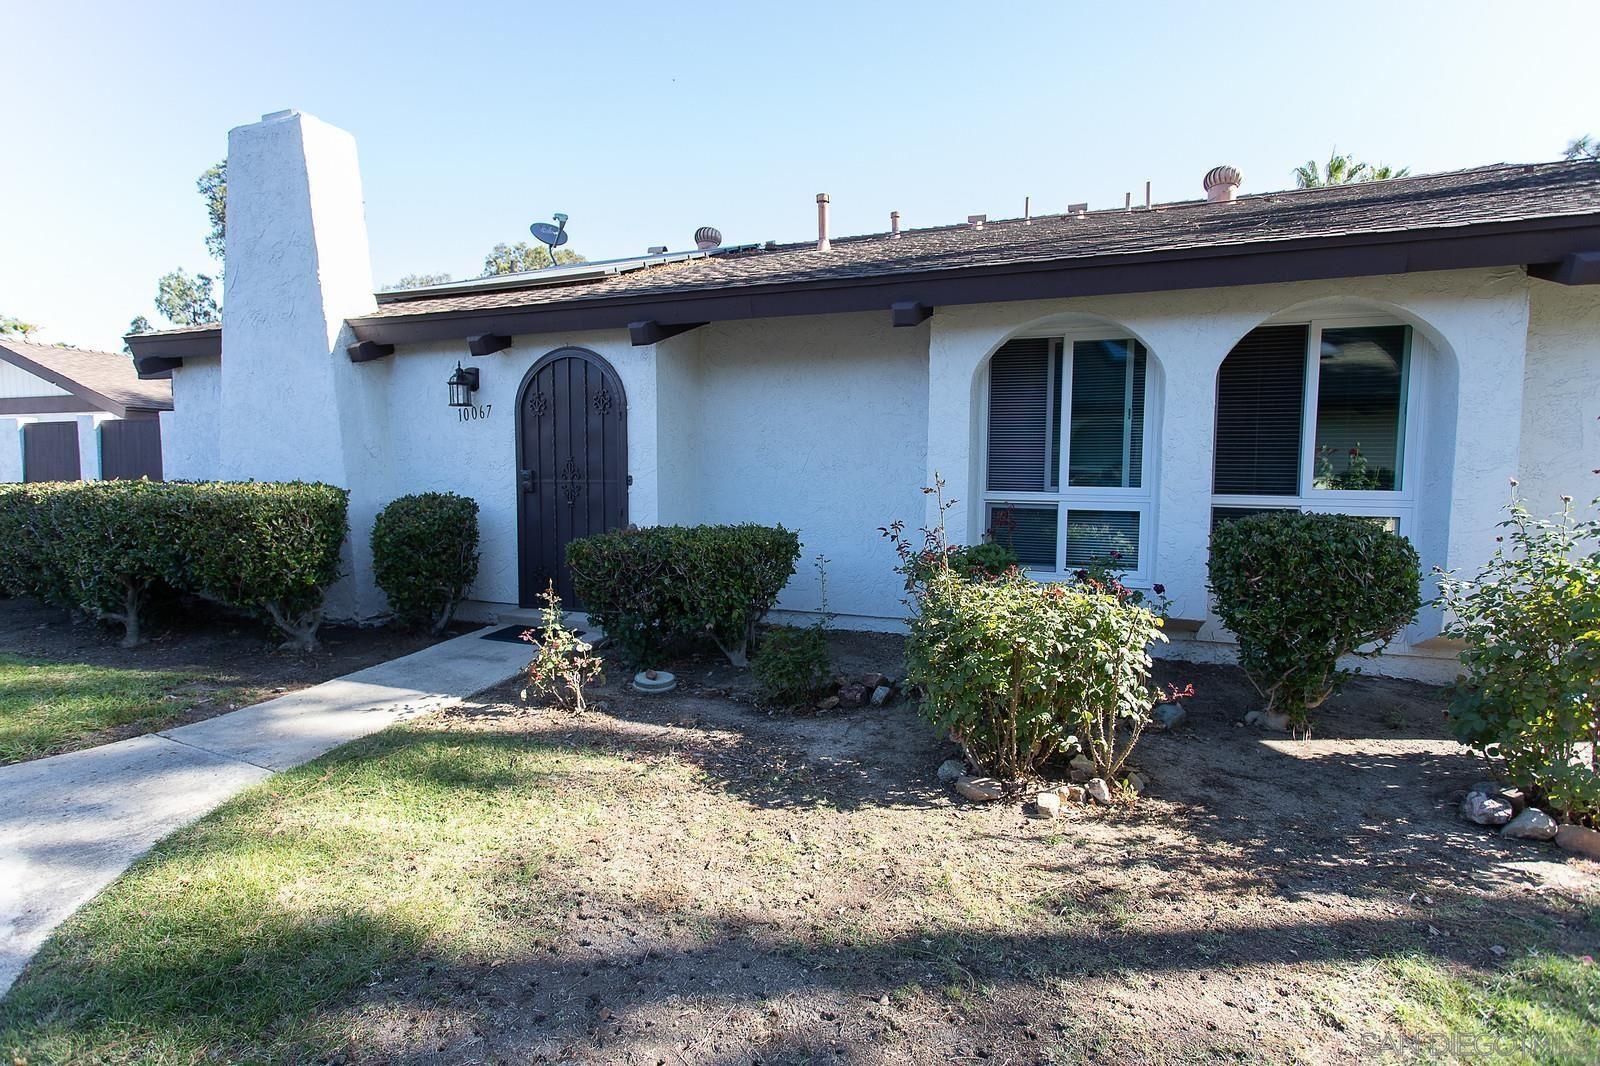 Photo of 10067 Nuerto Ln, Spring Valley, CA 91977 (MLS # 210029577)